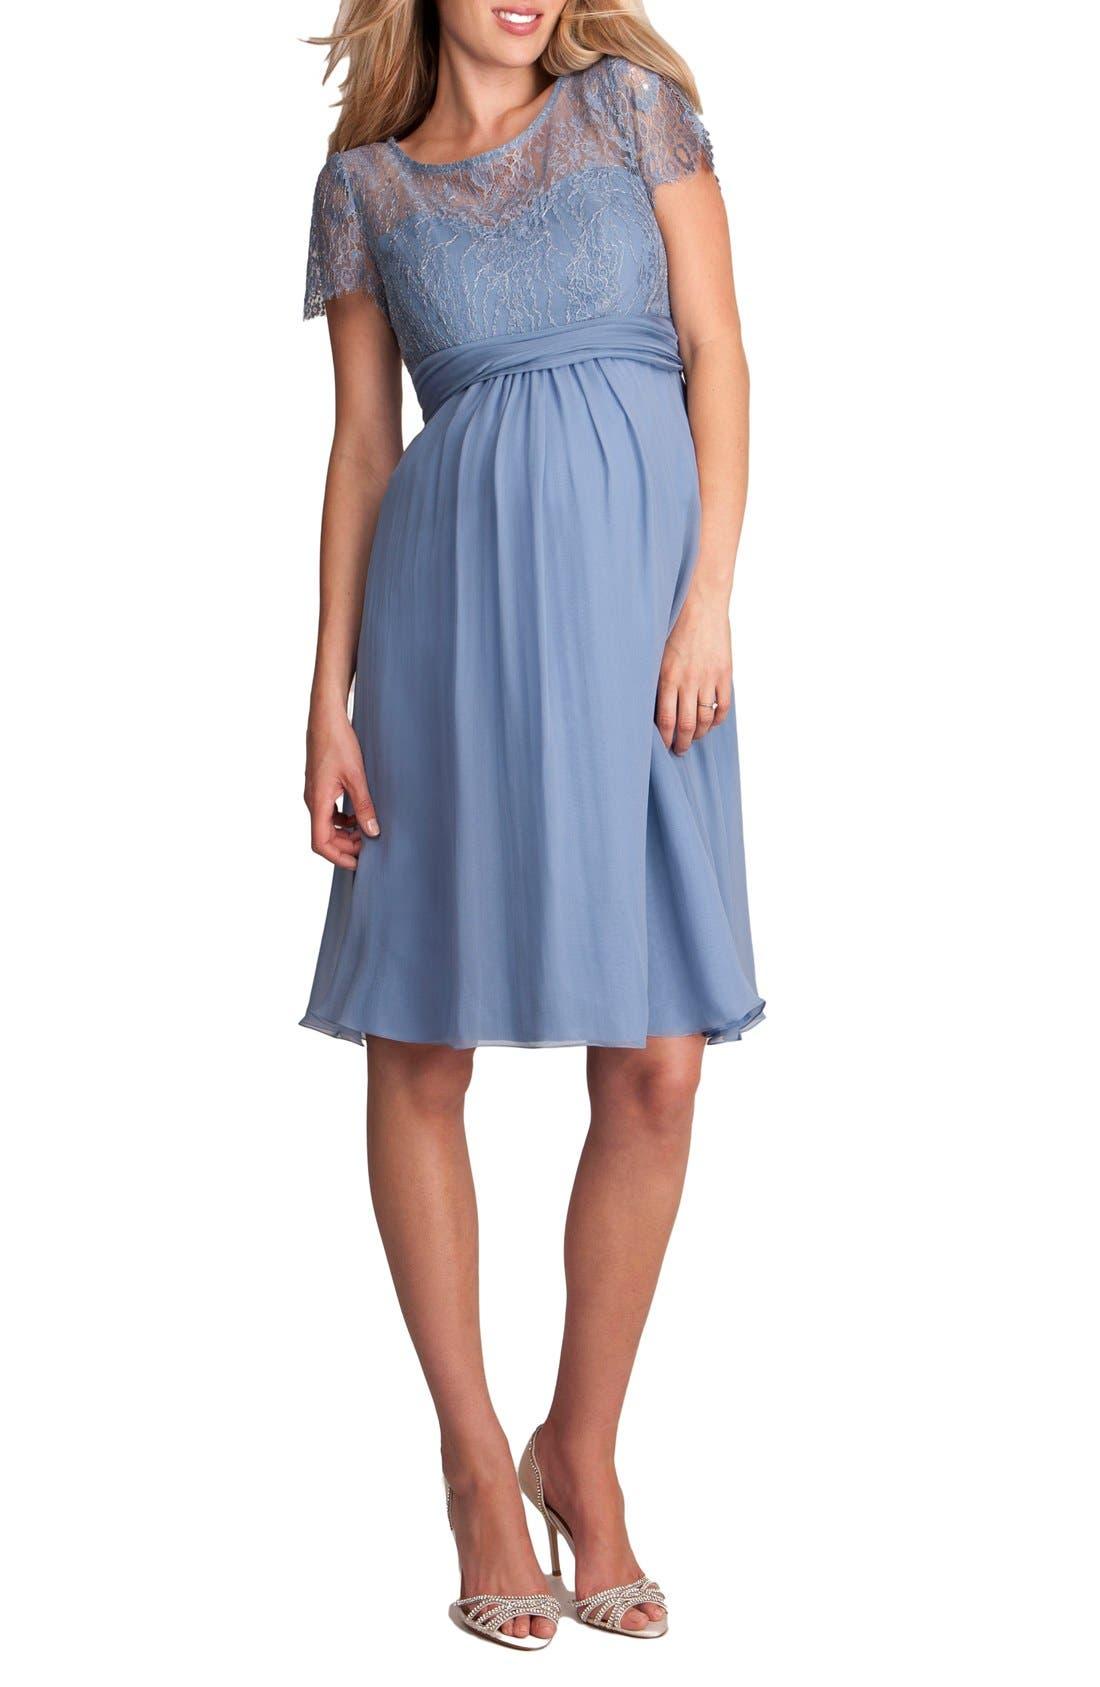 'Genevieve Luxe' Sleeveless Lace & Silk Maternity Dress,                             Main thumbnail 1, color,                             Paleblue